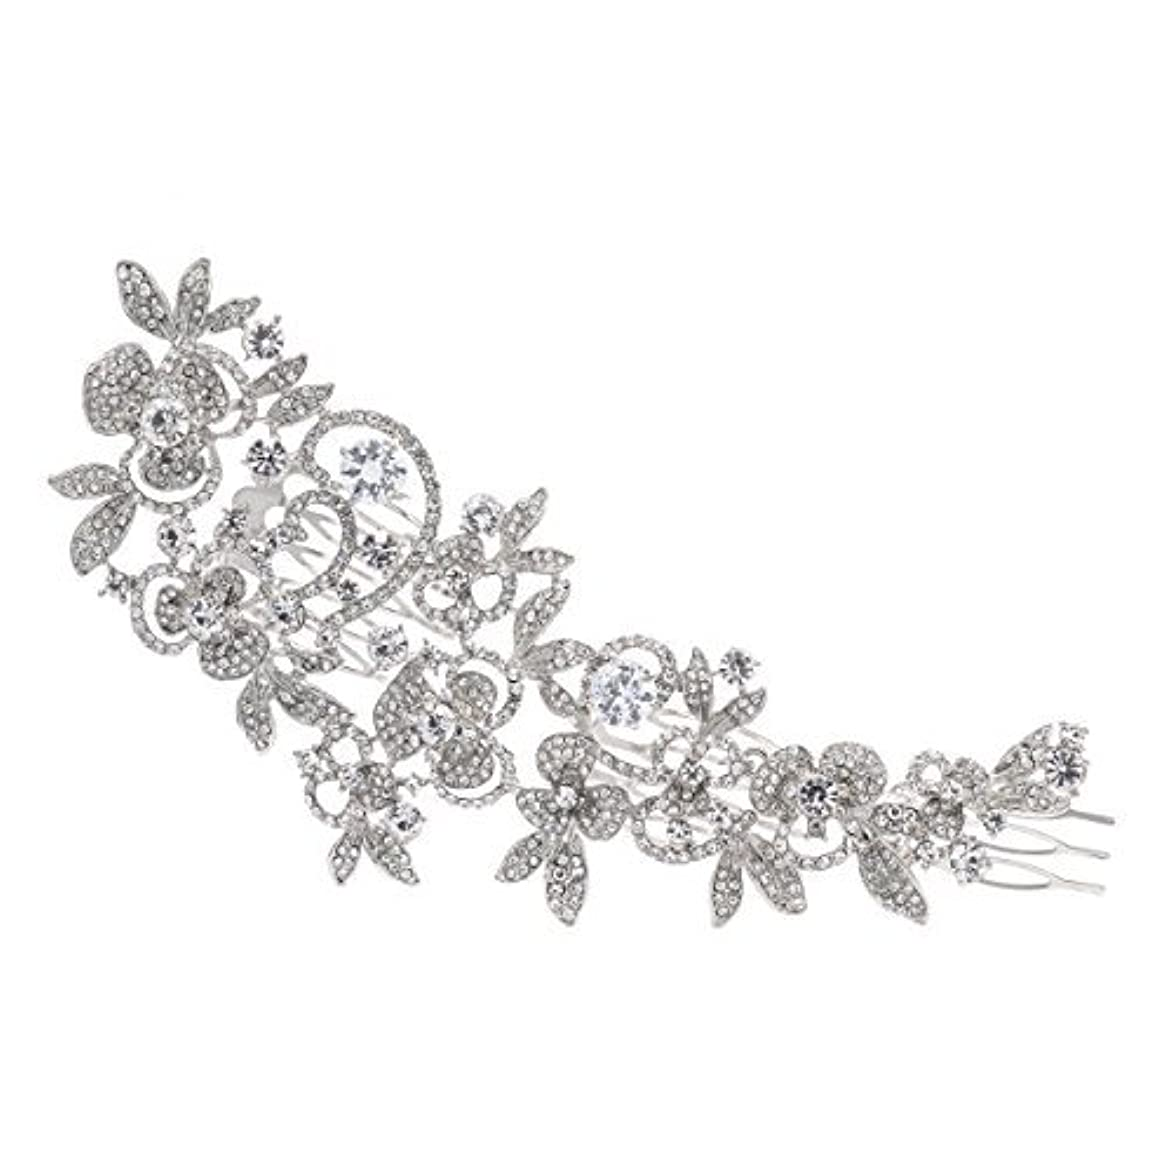 援助休暇同性愛者Sparkly Long Flower Hair Comb Rhinestone Hairpins Bridal Wedding Hair Accessories Jewelry Austrian Crystals Hair Clips FA5027 (Clear) [並行輸入品]